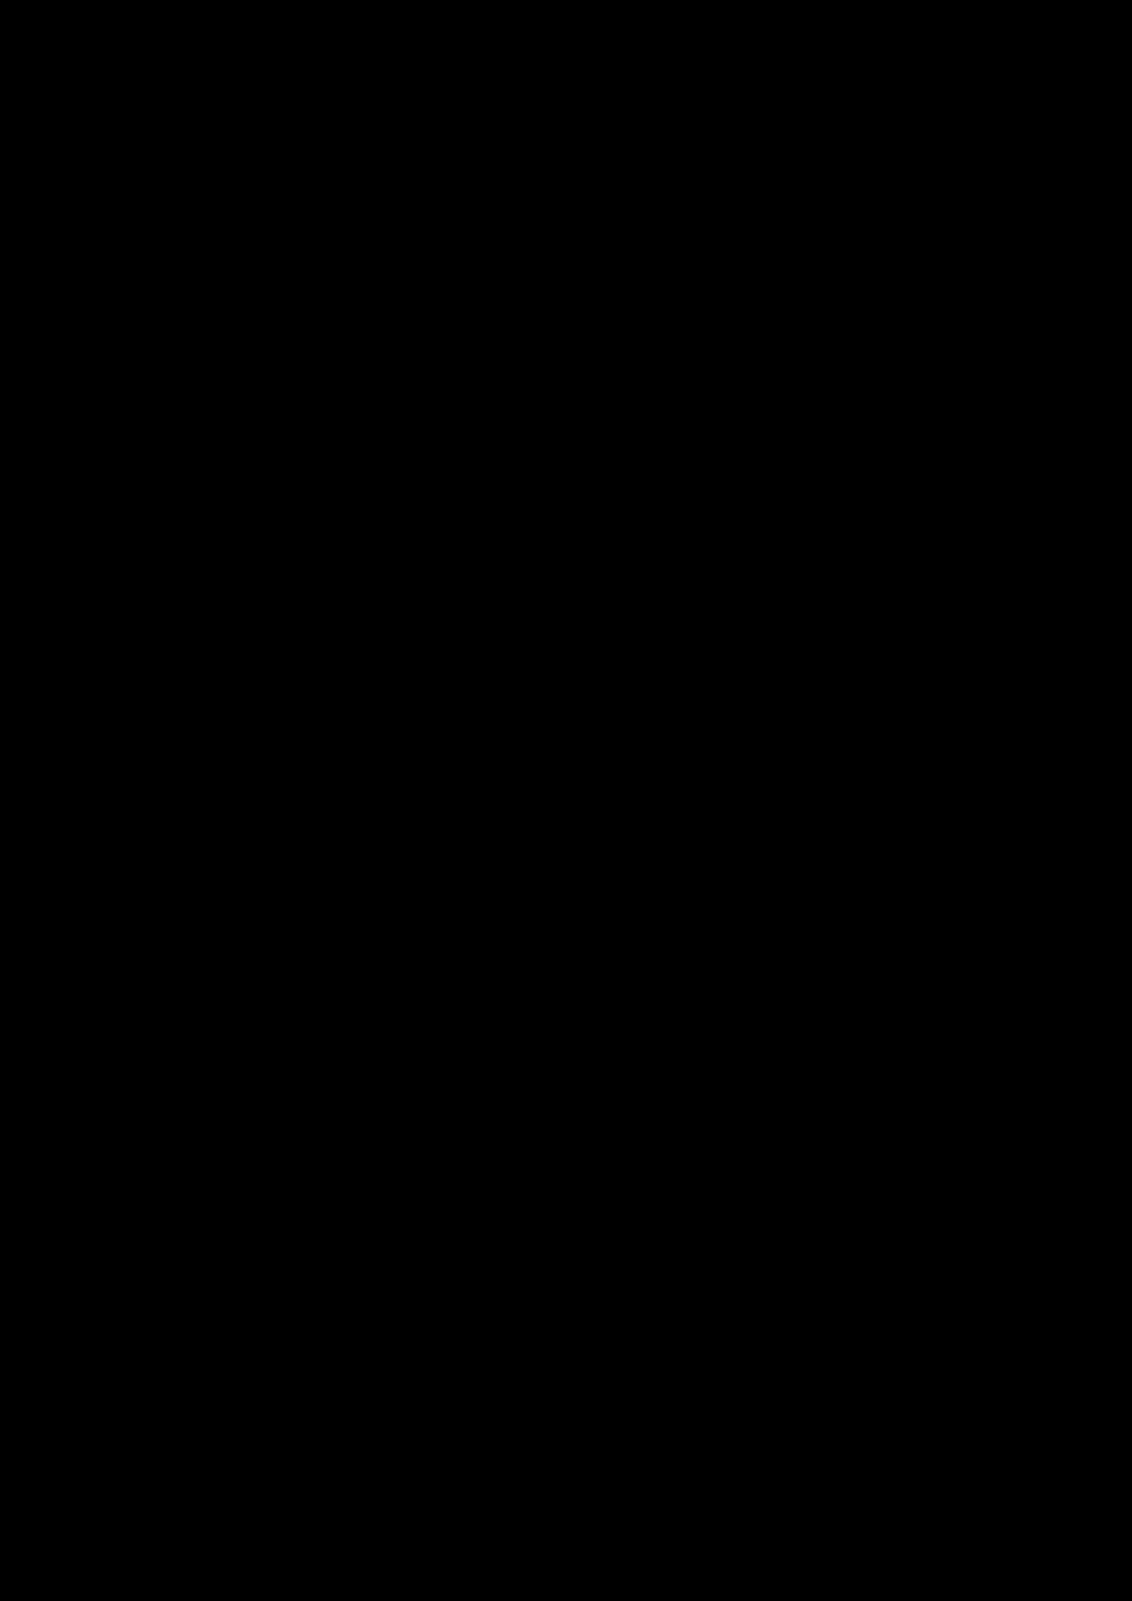 Korolevstvo slez slide, Image 86